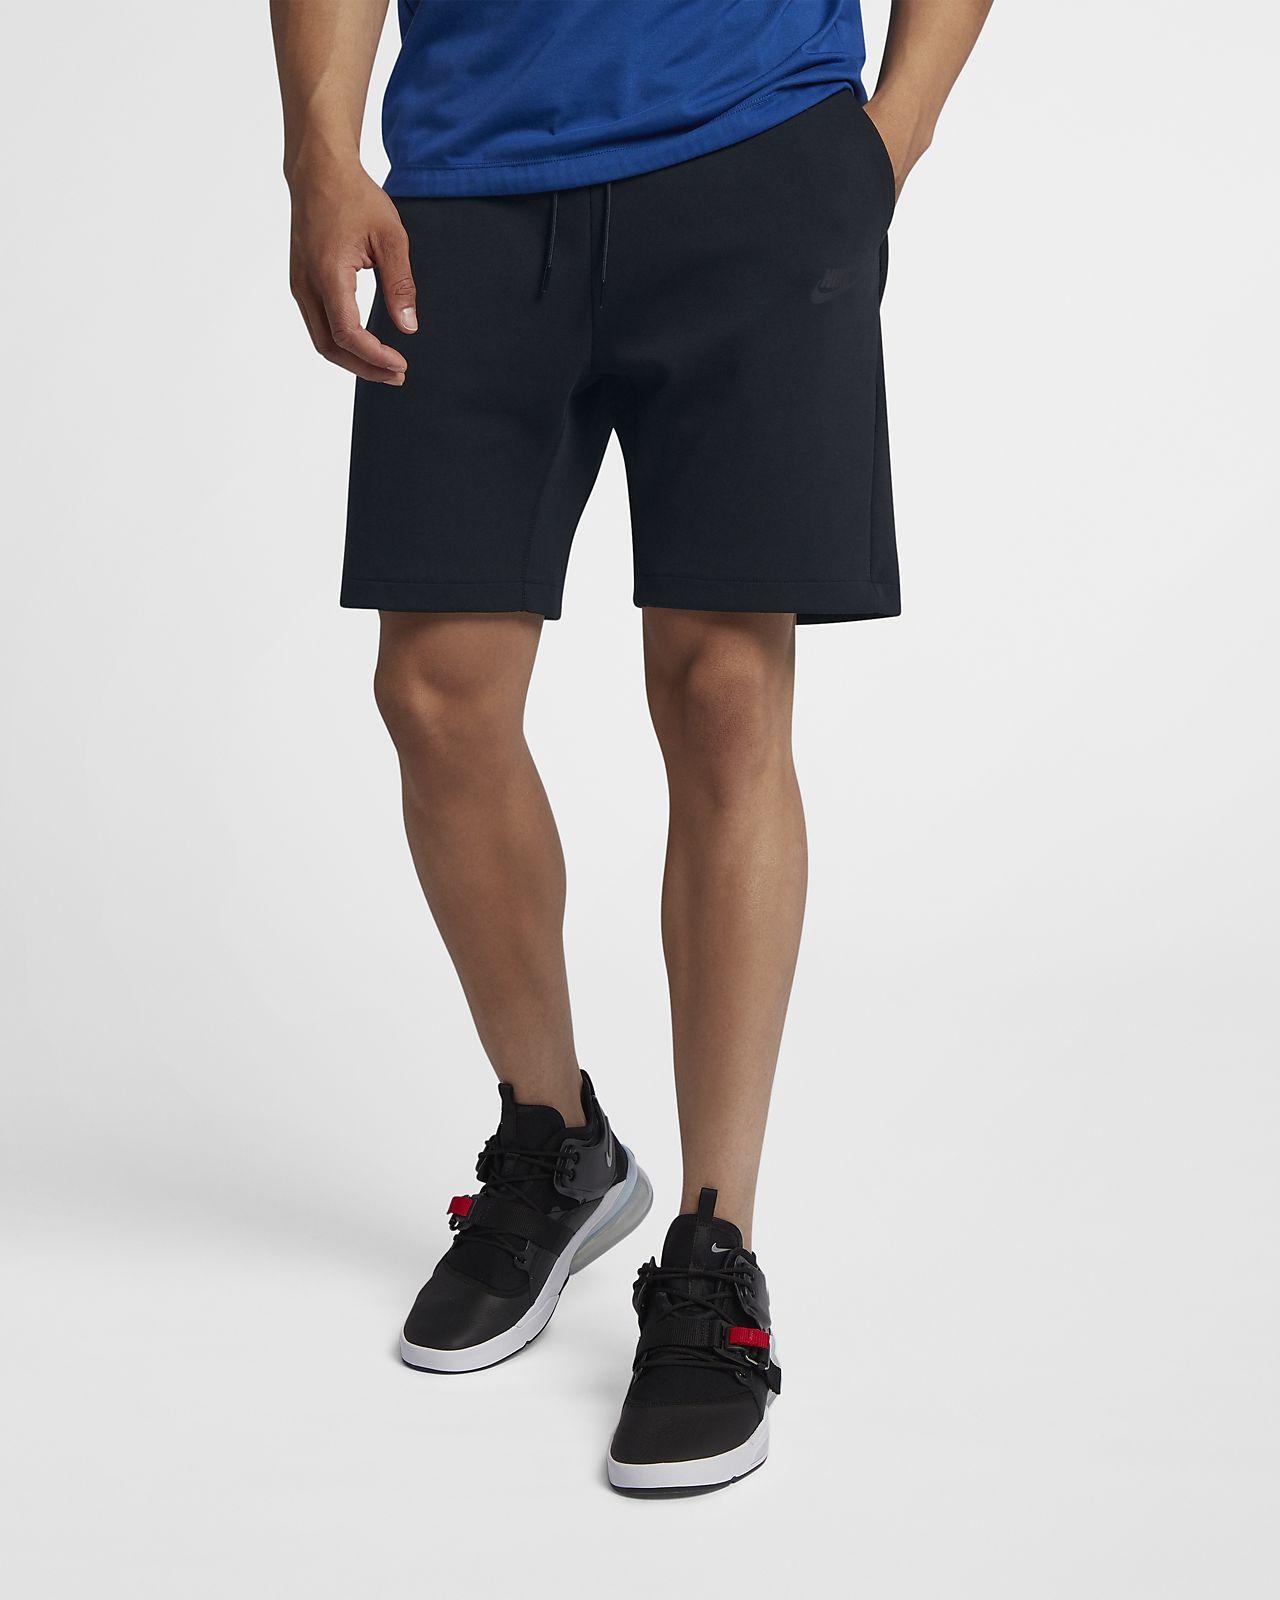 Nike Sportswear Tech Fleece Pantalón corto de tejido Fleece - Hombre